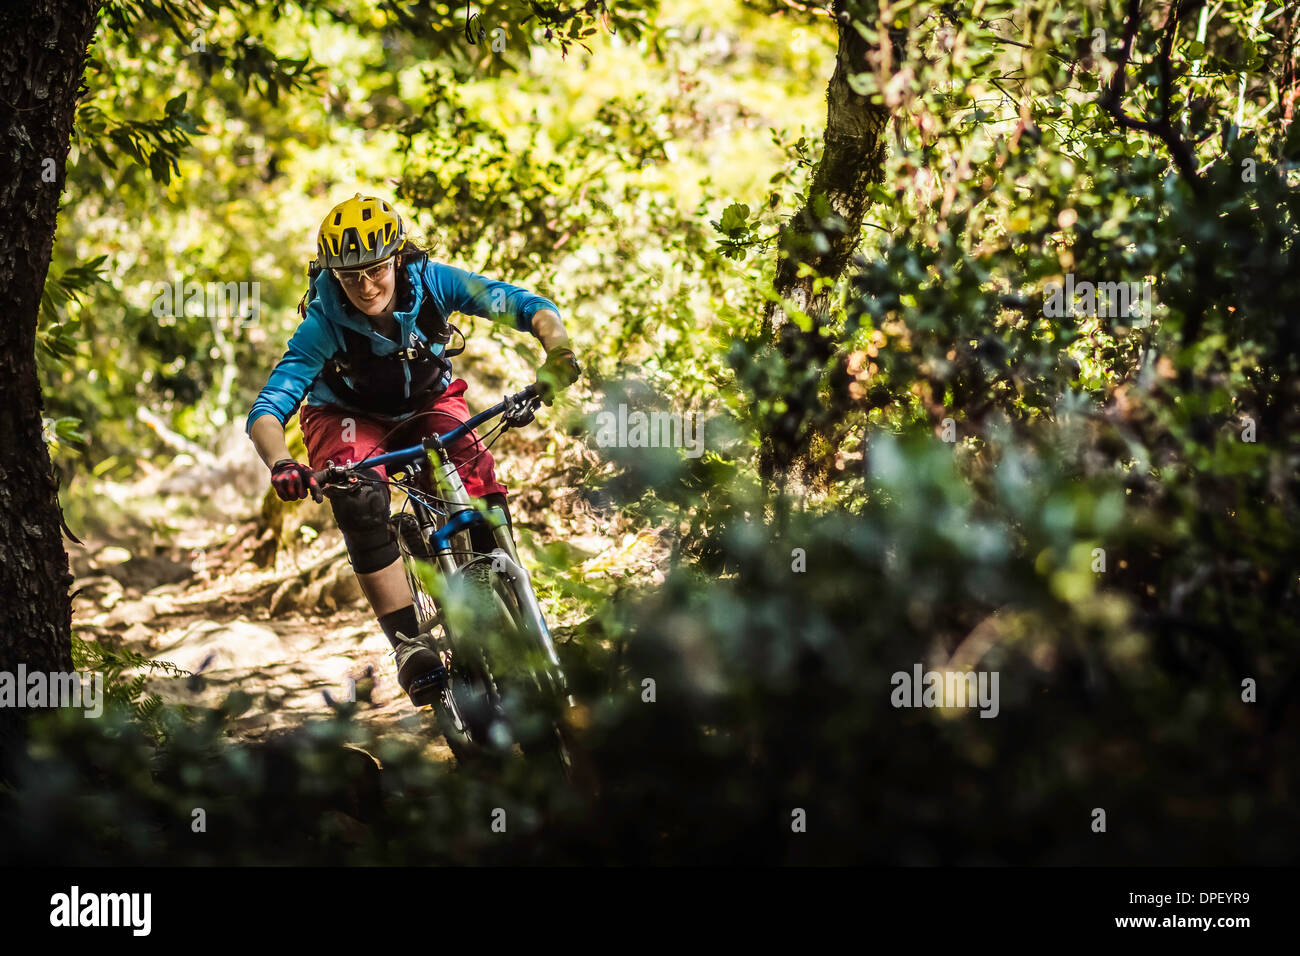 Young woman mountain biking, Soquel Demonstration State Forest, Santa Cruz, California, USA - Stock Image